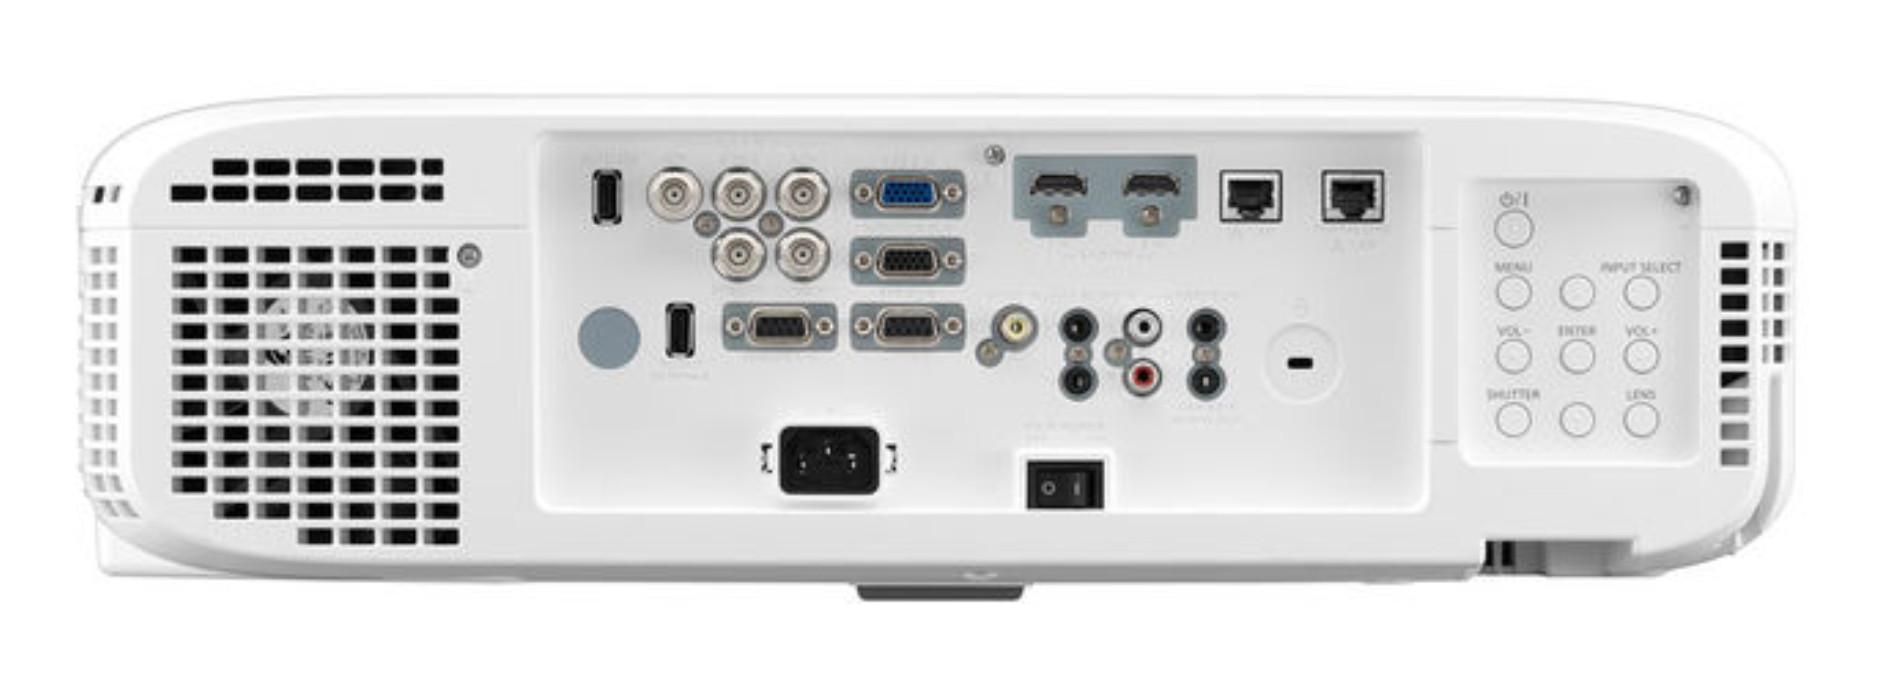 5800 Lumen WXGA LCD Projector